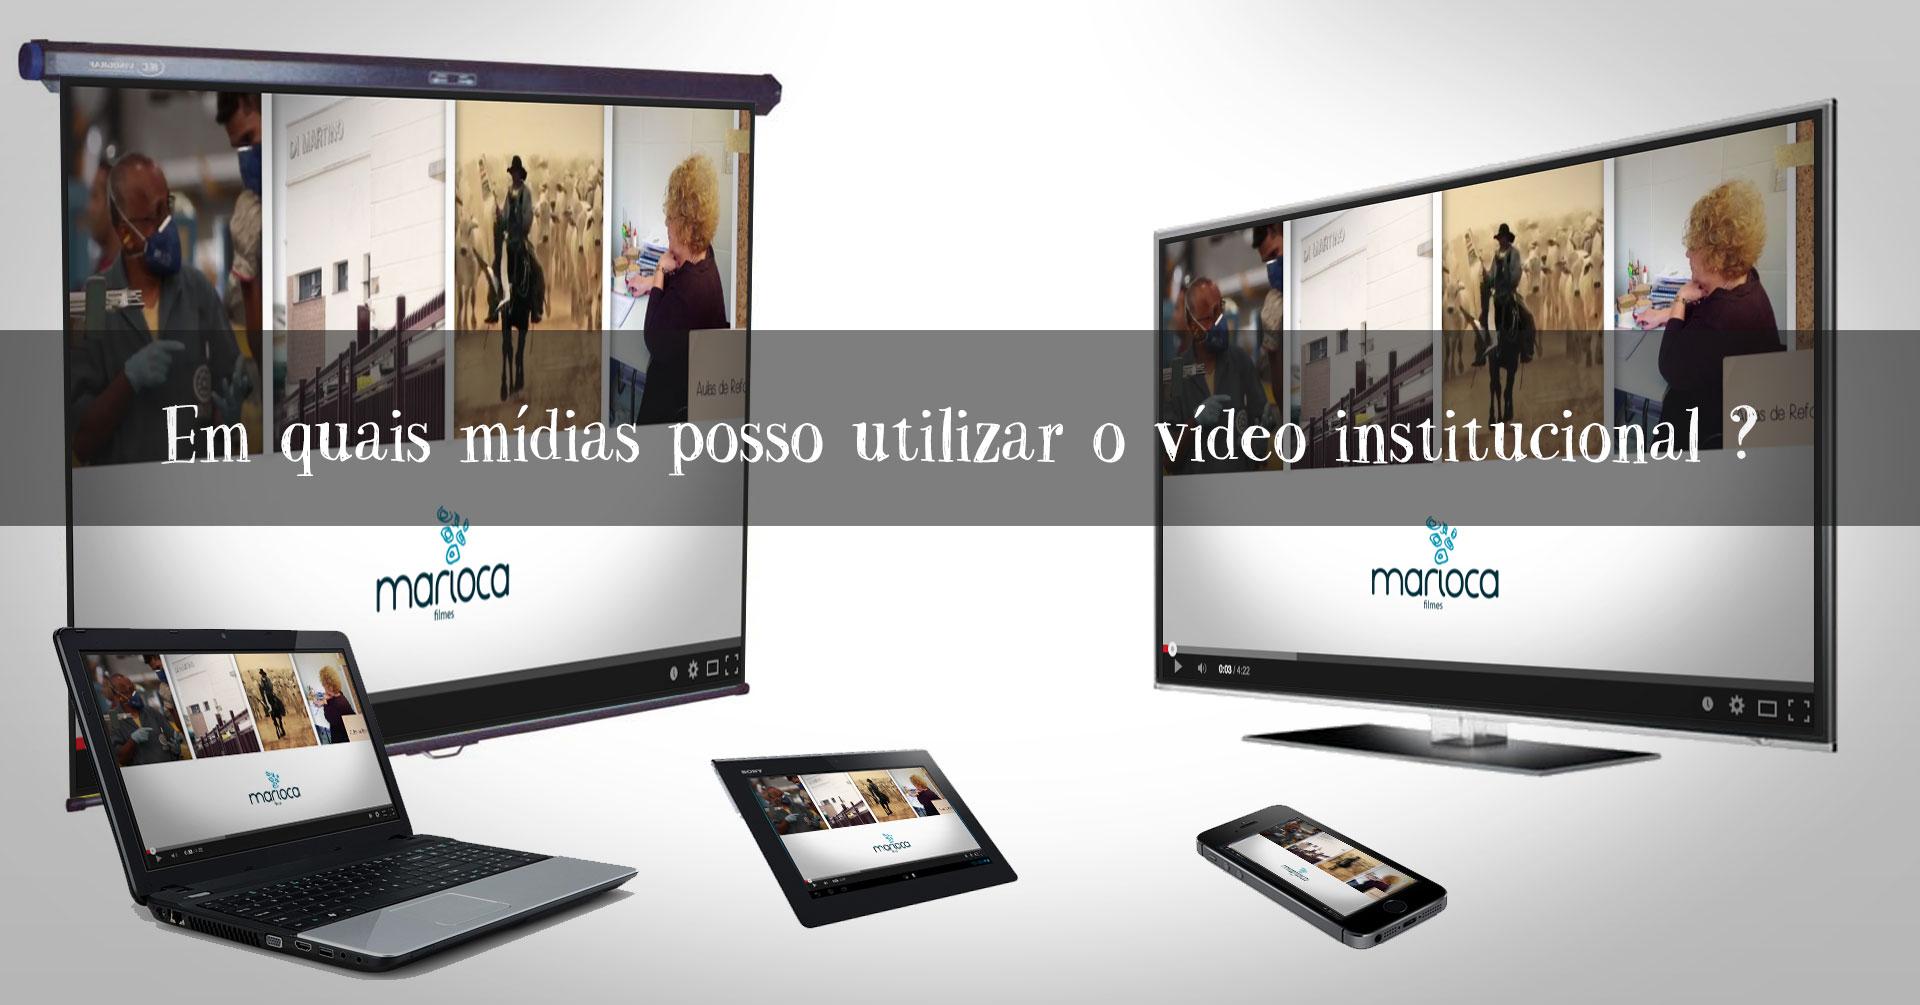 midias vídeo institucional